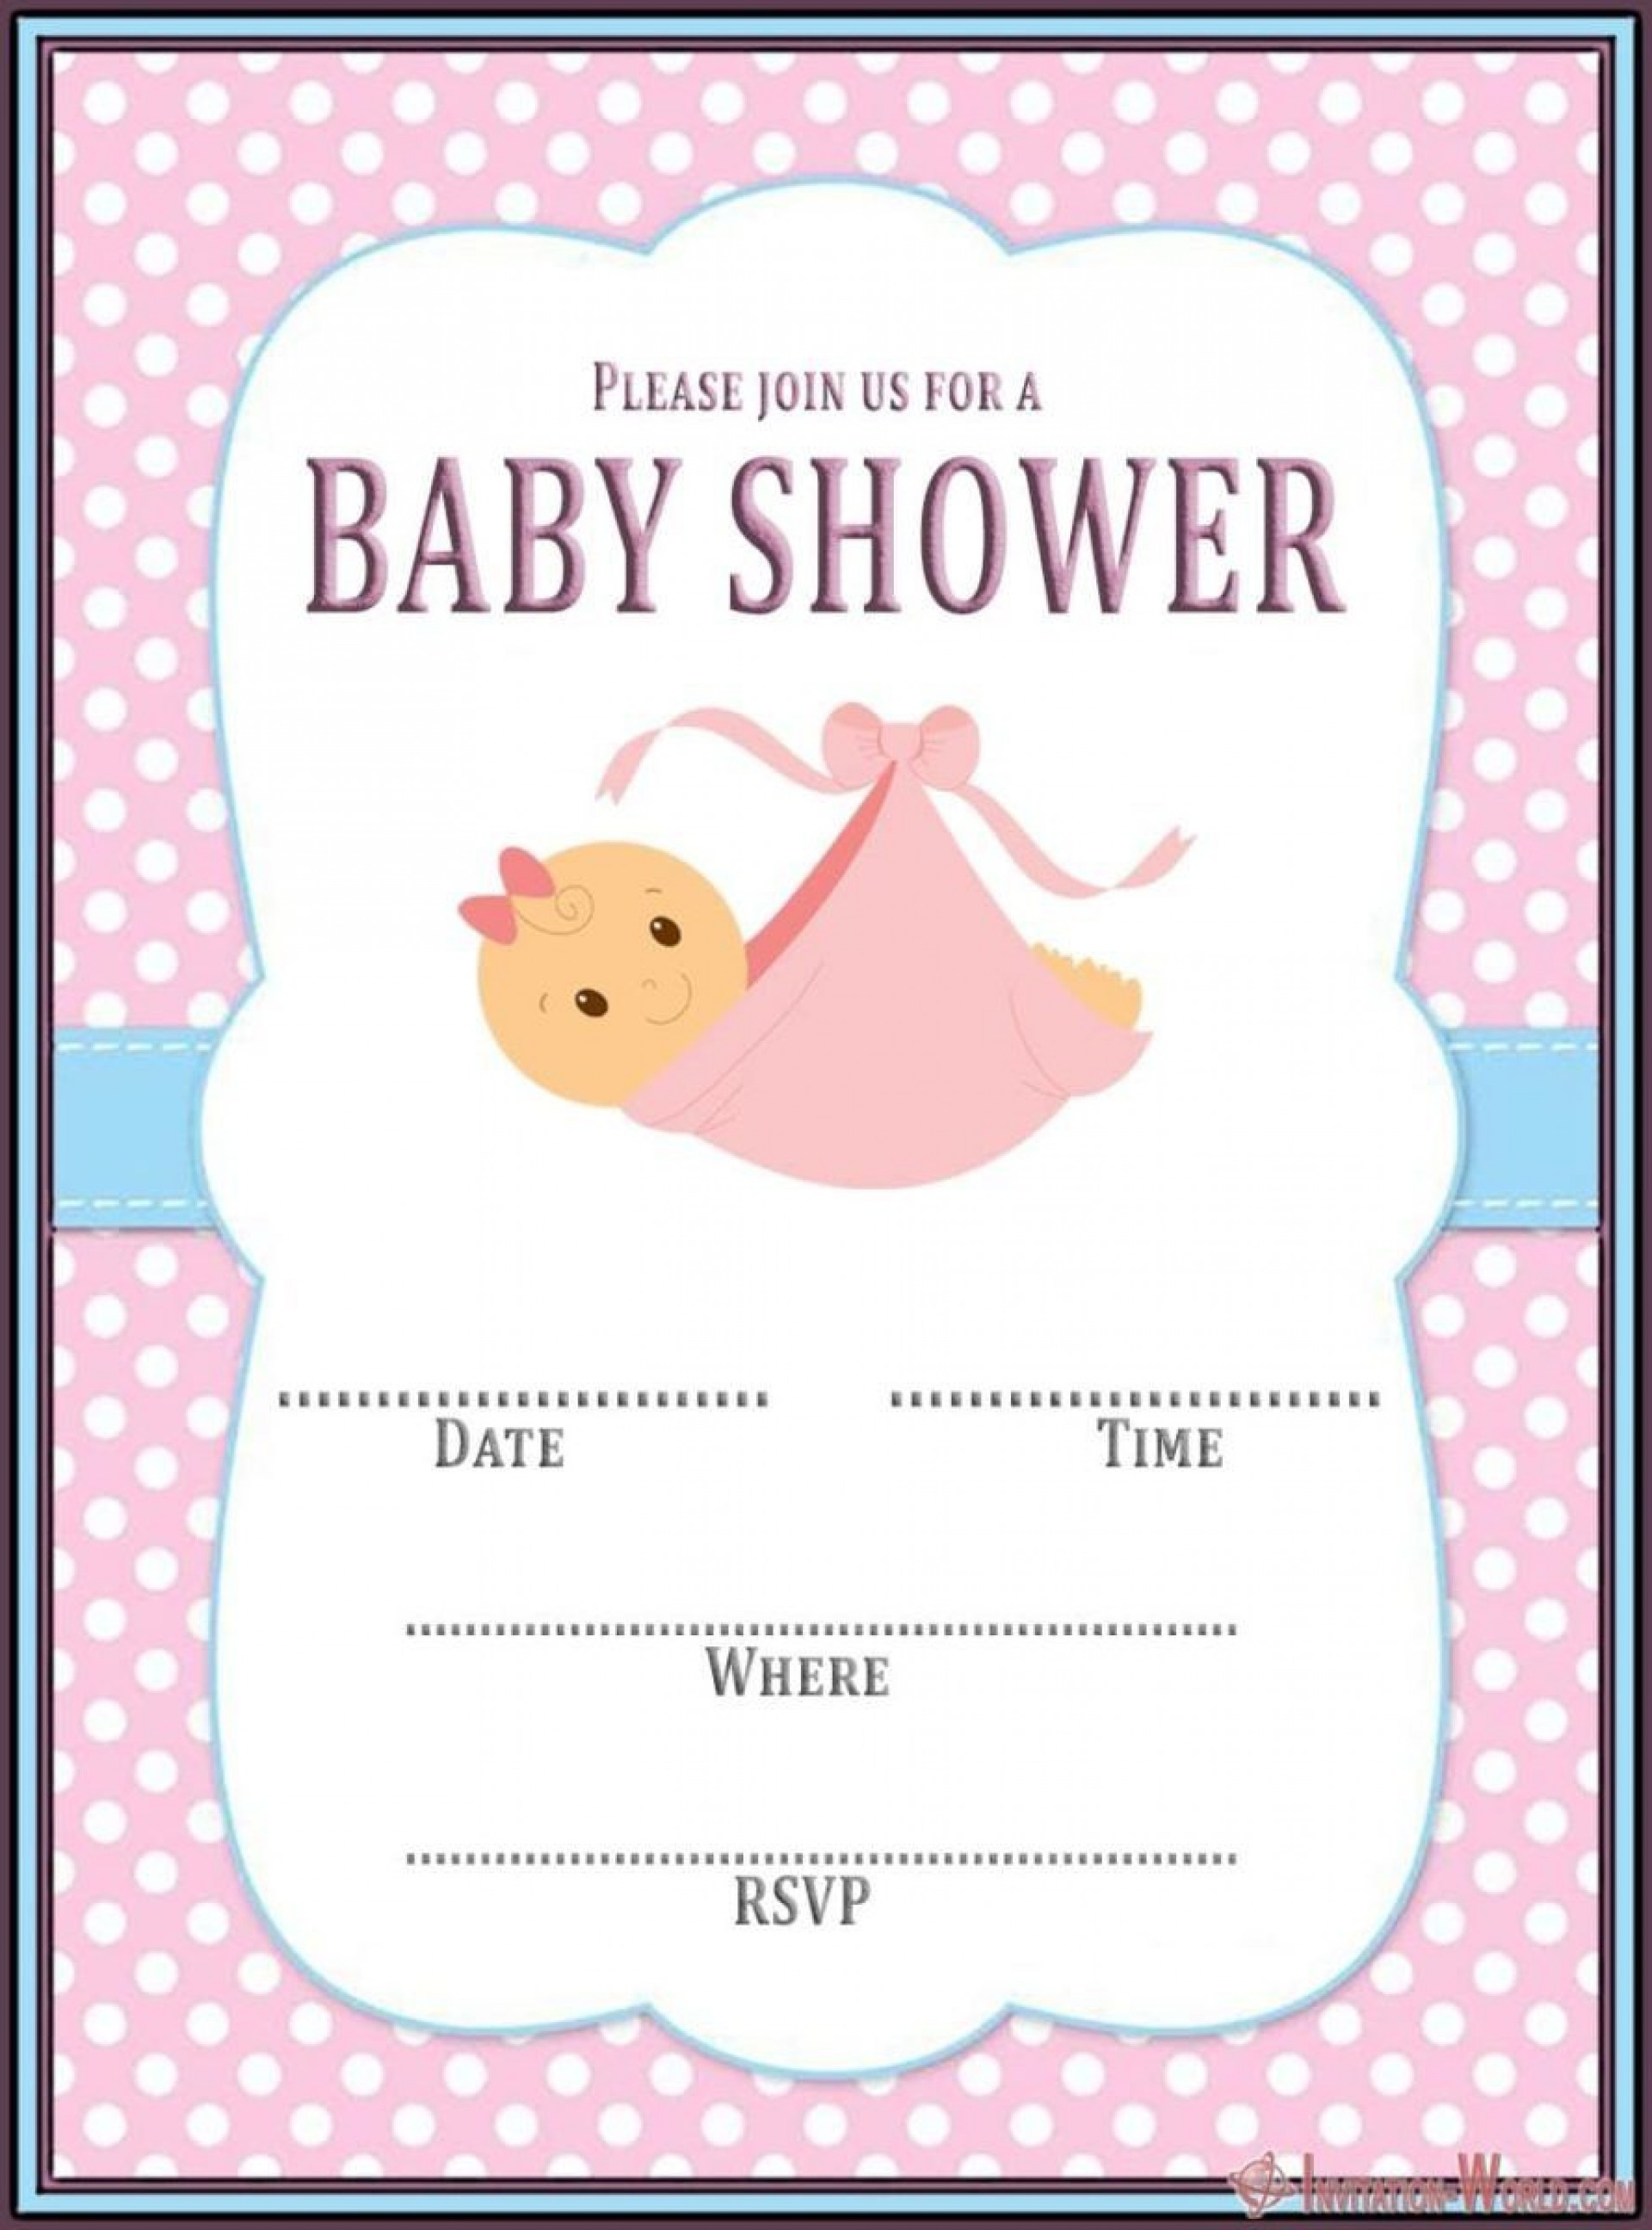 007 Astounding Free Baby Shower Invitation Template Editable High Resolution  Digital Microsoft Word1920